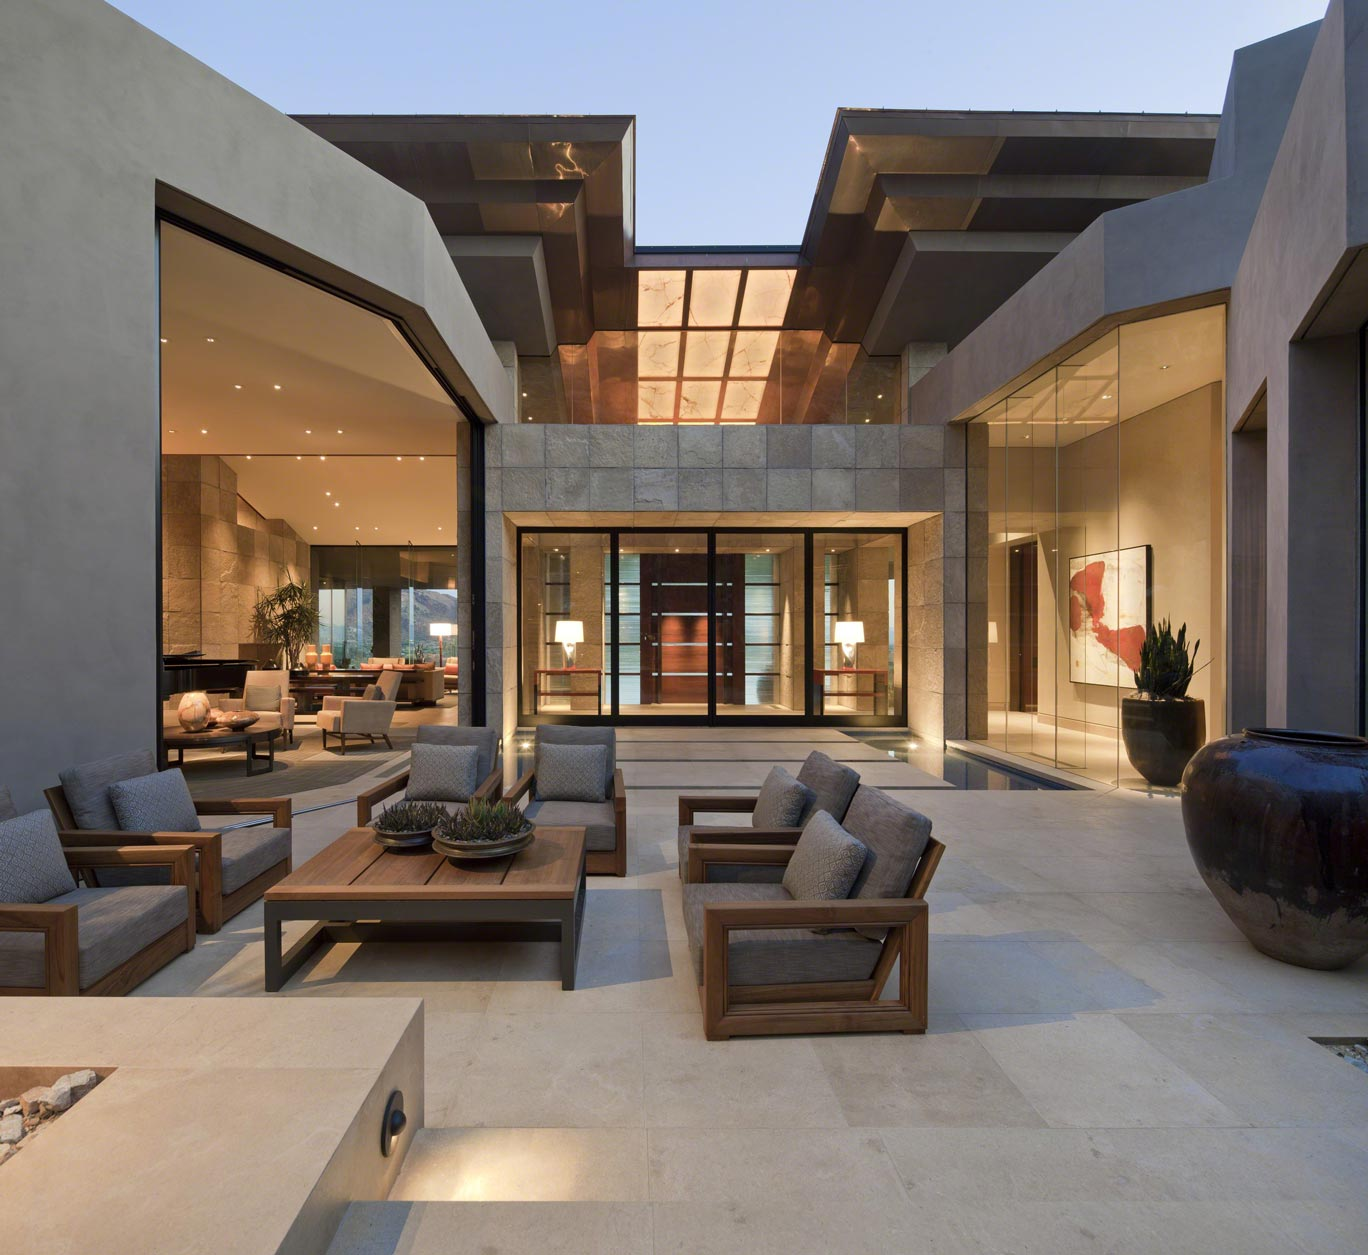 Contemporary outdoor living spaces david michael miller for Contemporary outdoor living spaces